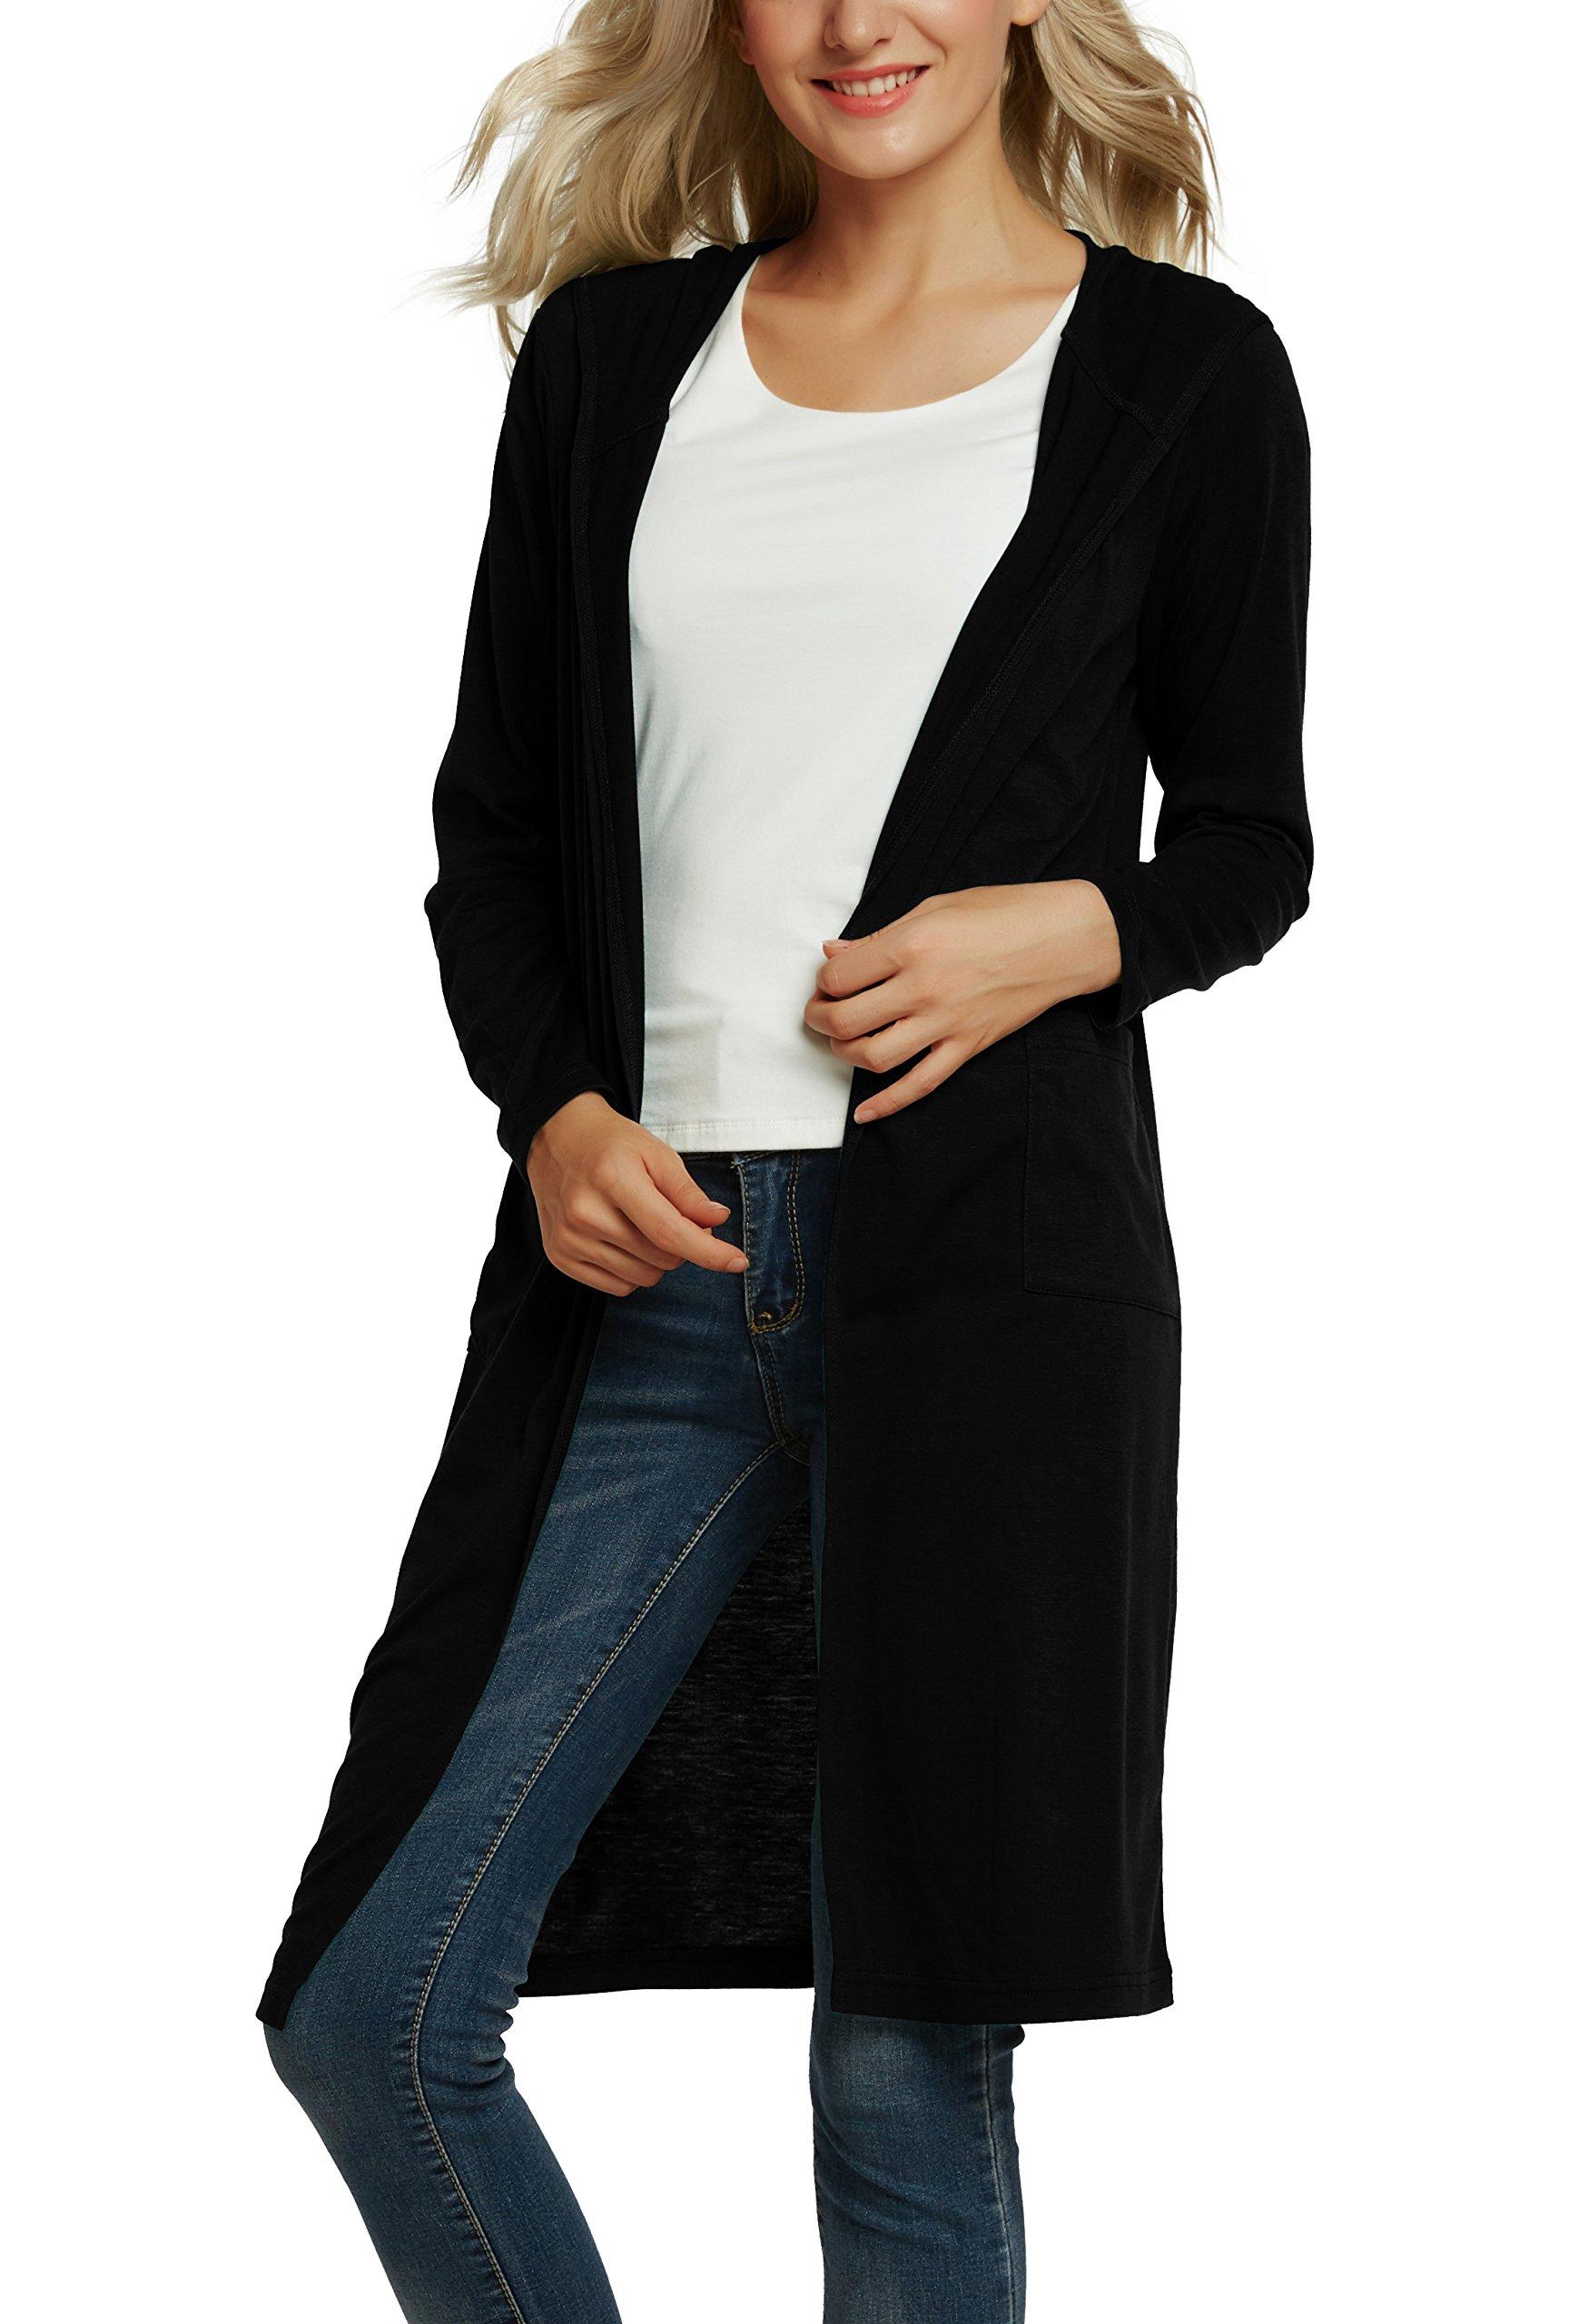 Urban CoCo Women's Classic Open Front Lightweight Long Hooded Cardigan (XL, Black)